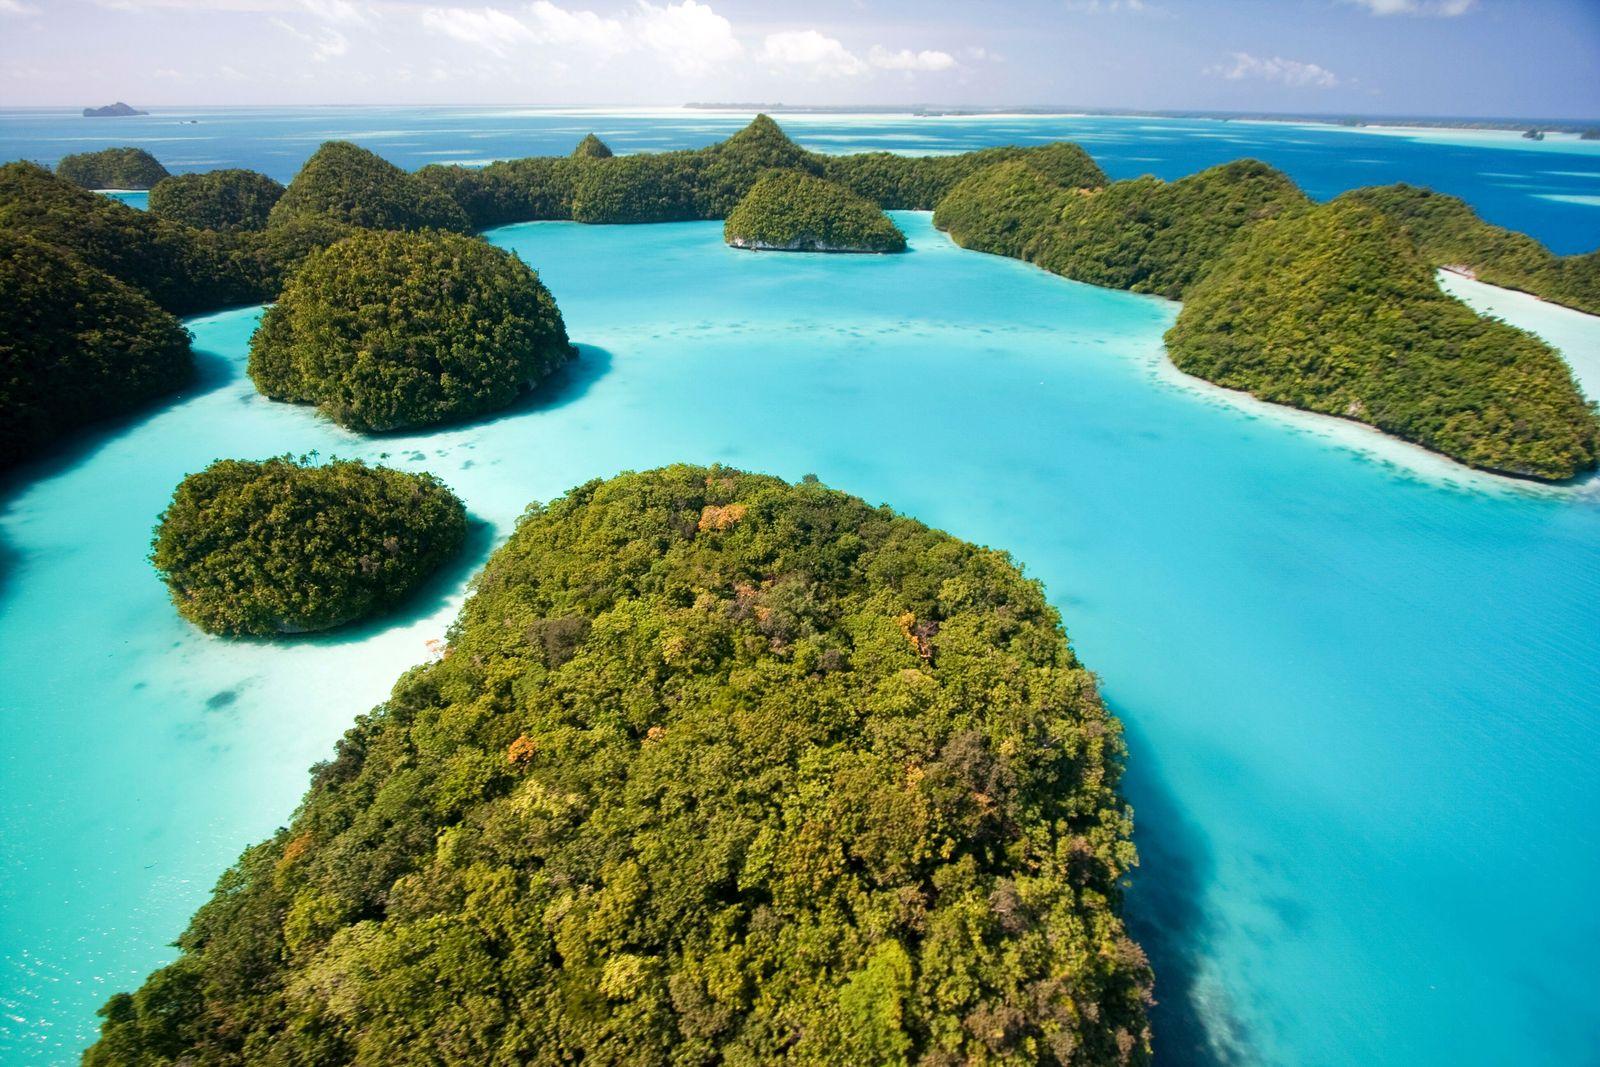 PALAU / Palau's Rock Islands